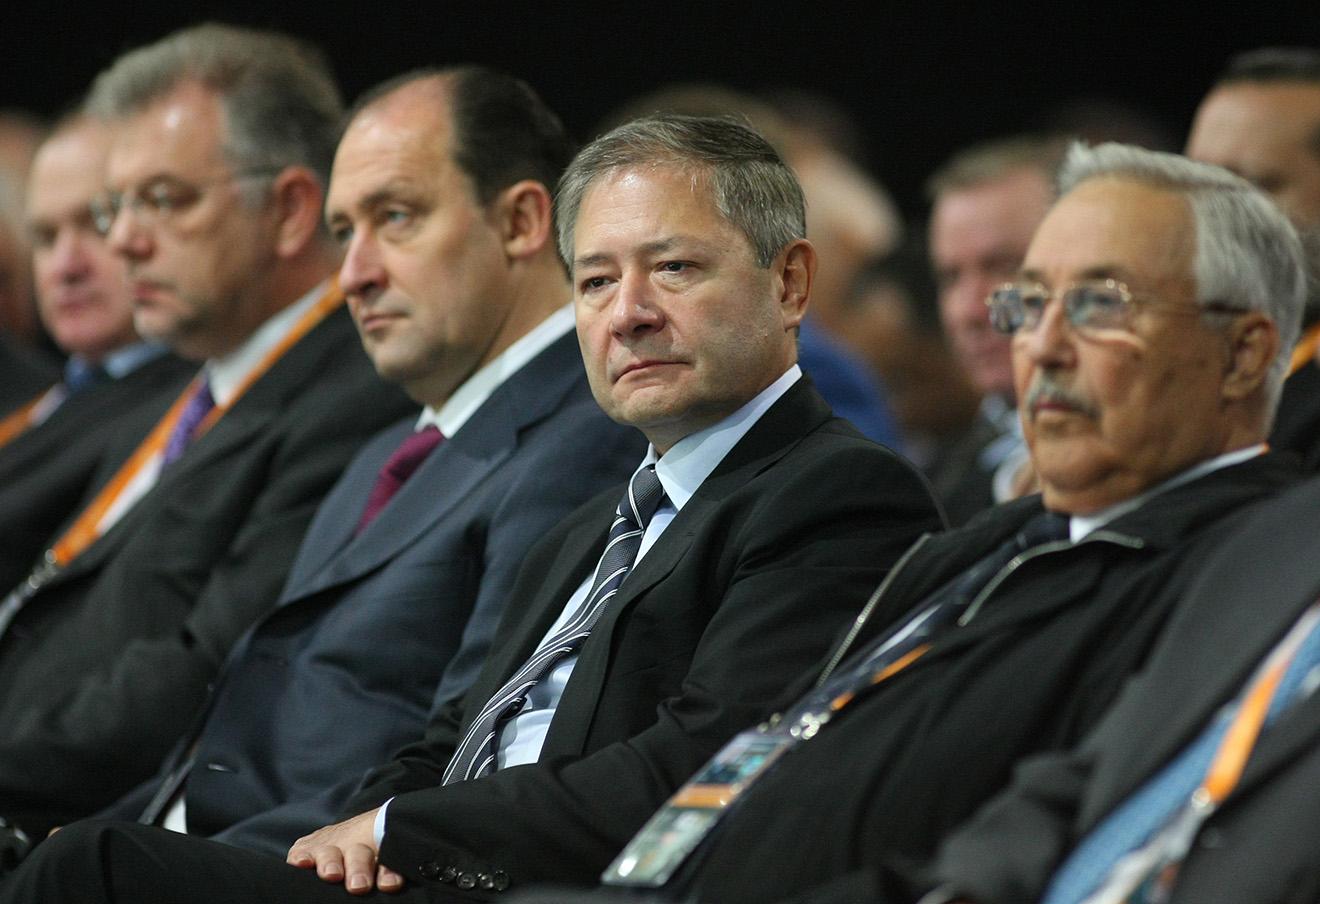 Леонид Рейман (второй справа).